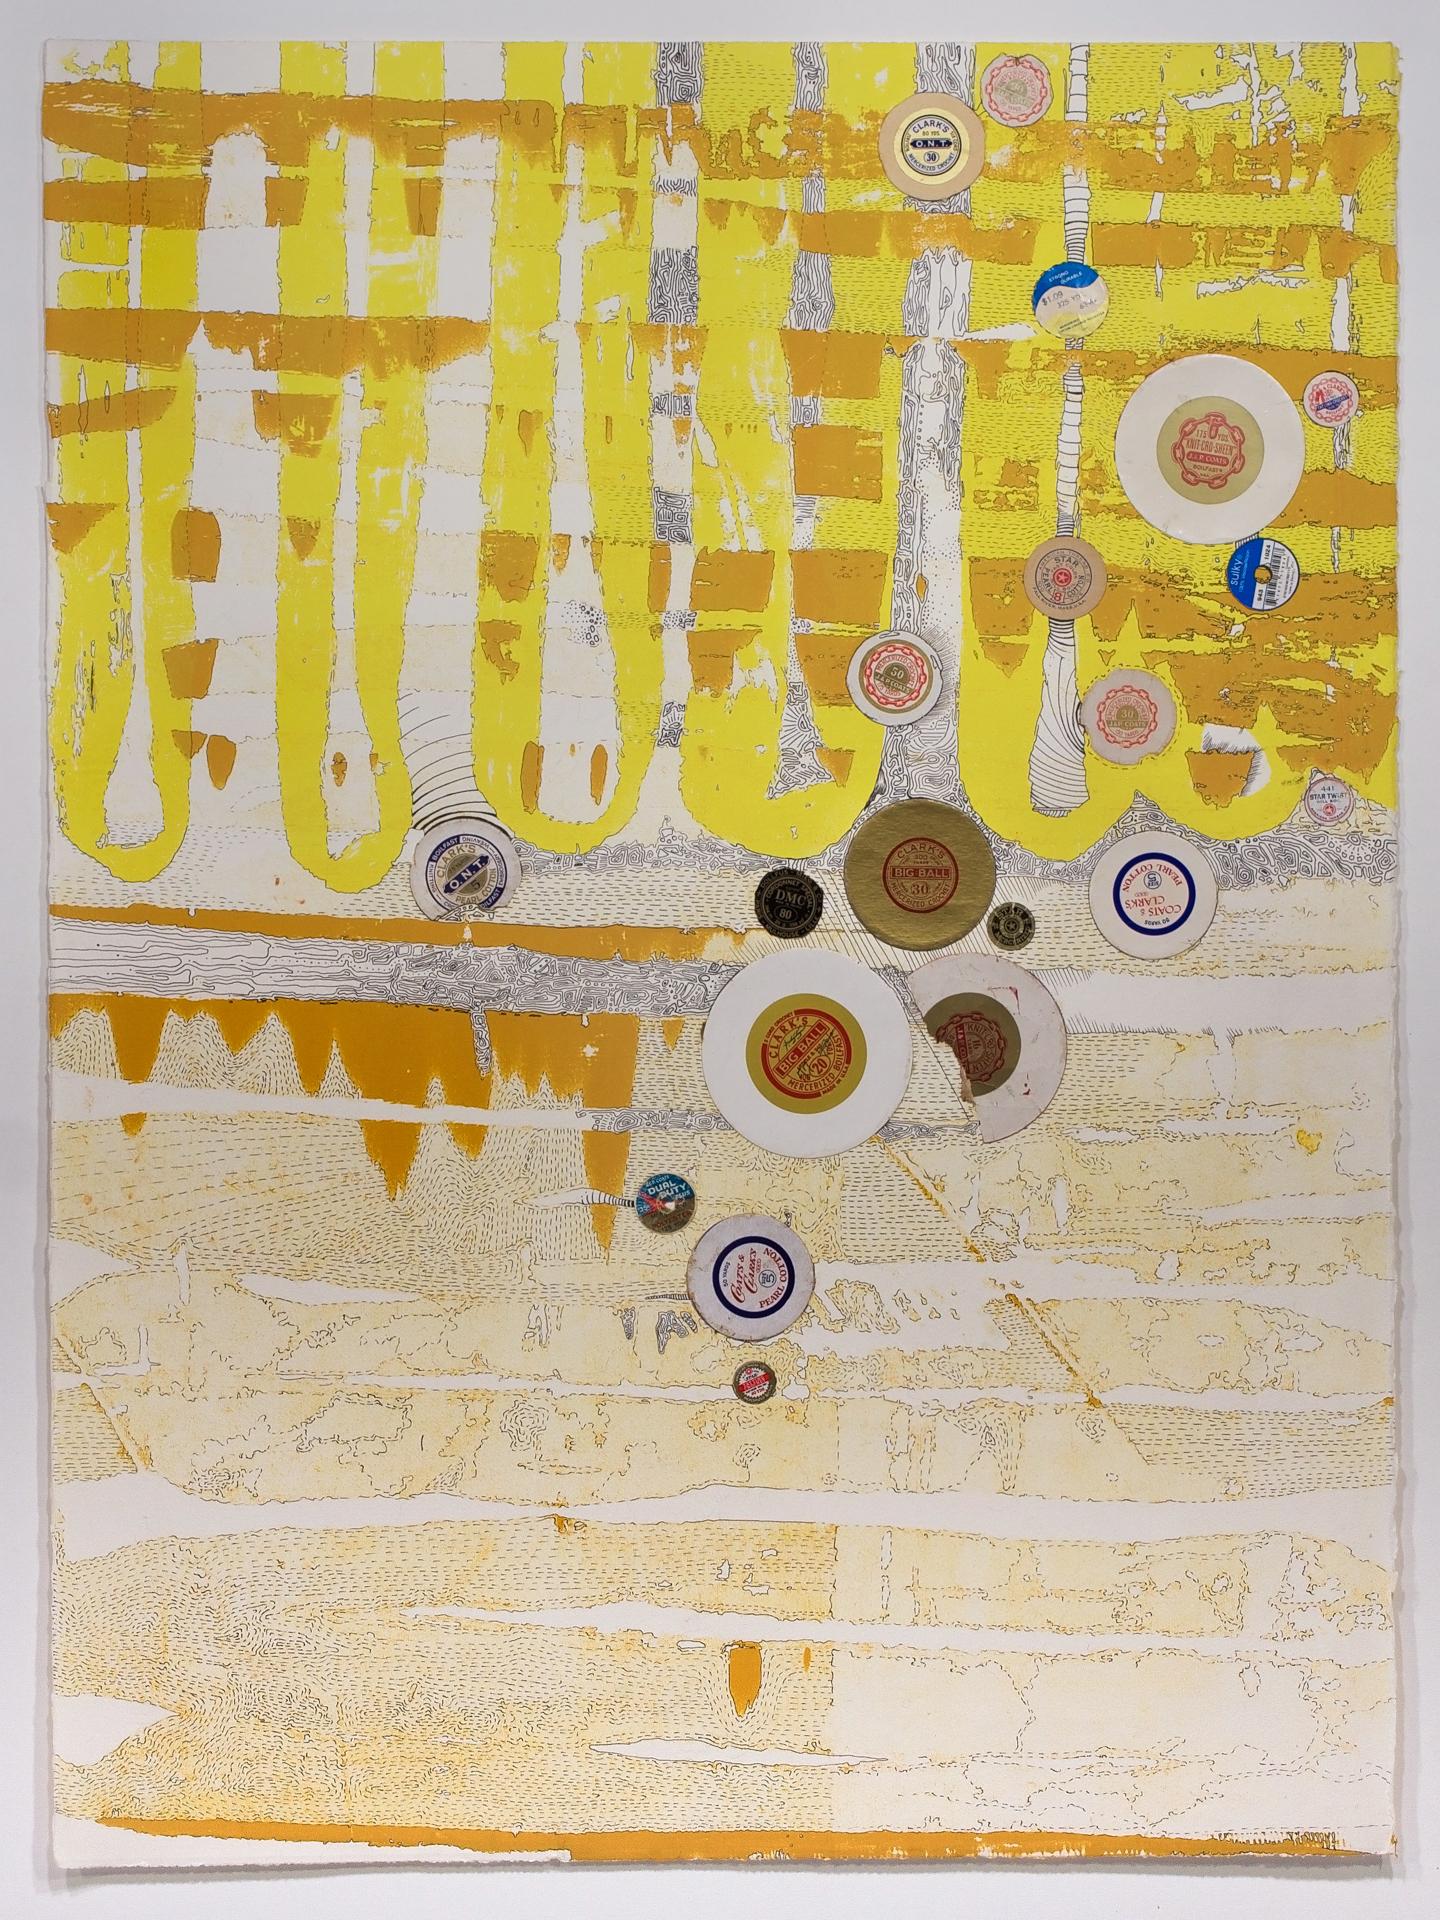 "2012 : 2015 | 42°1'41""N 93°36'22""W, silkscreen, collage, ink, 36"" x 27"" framed, 2015   SALE: $400  Original: $500"